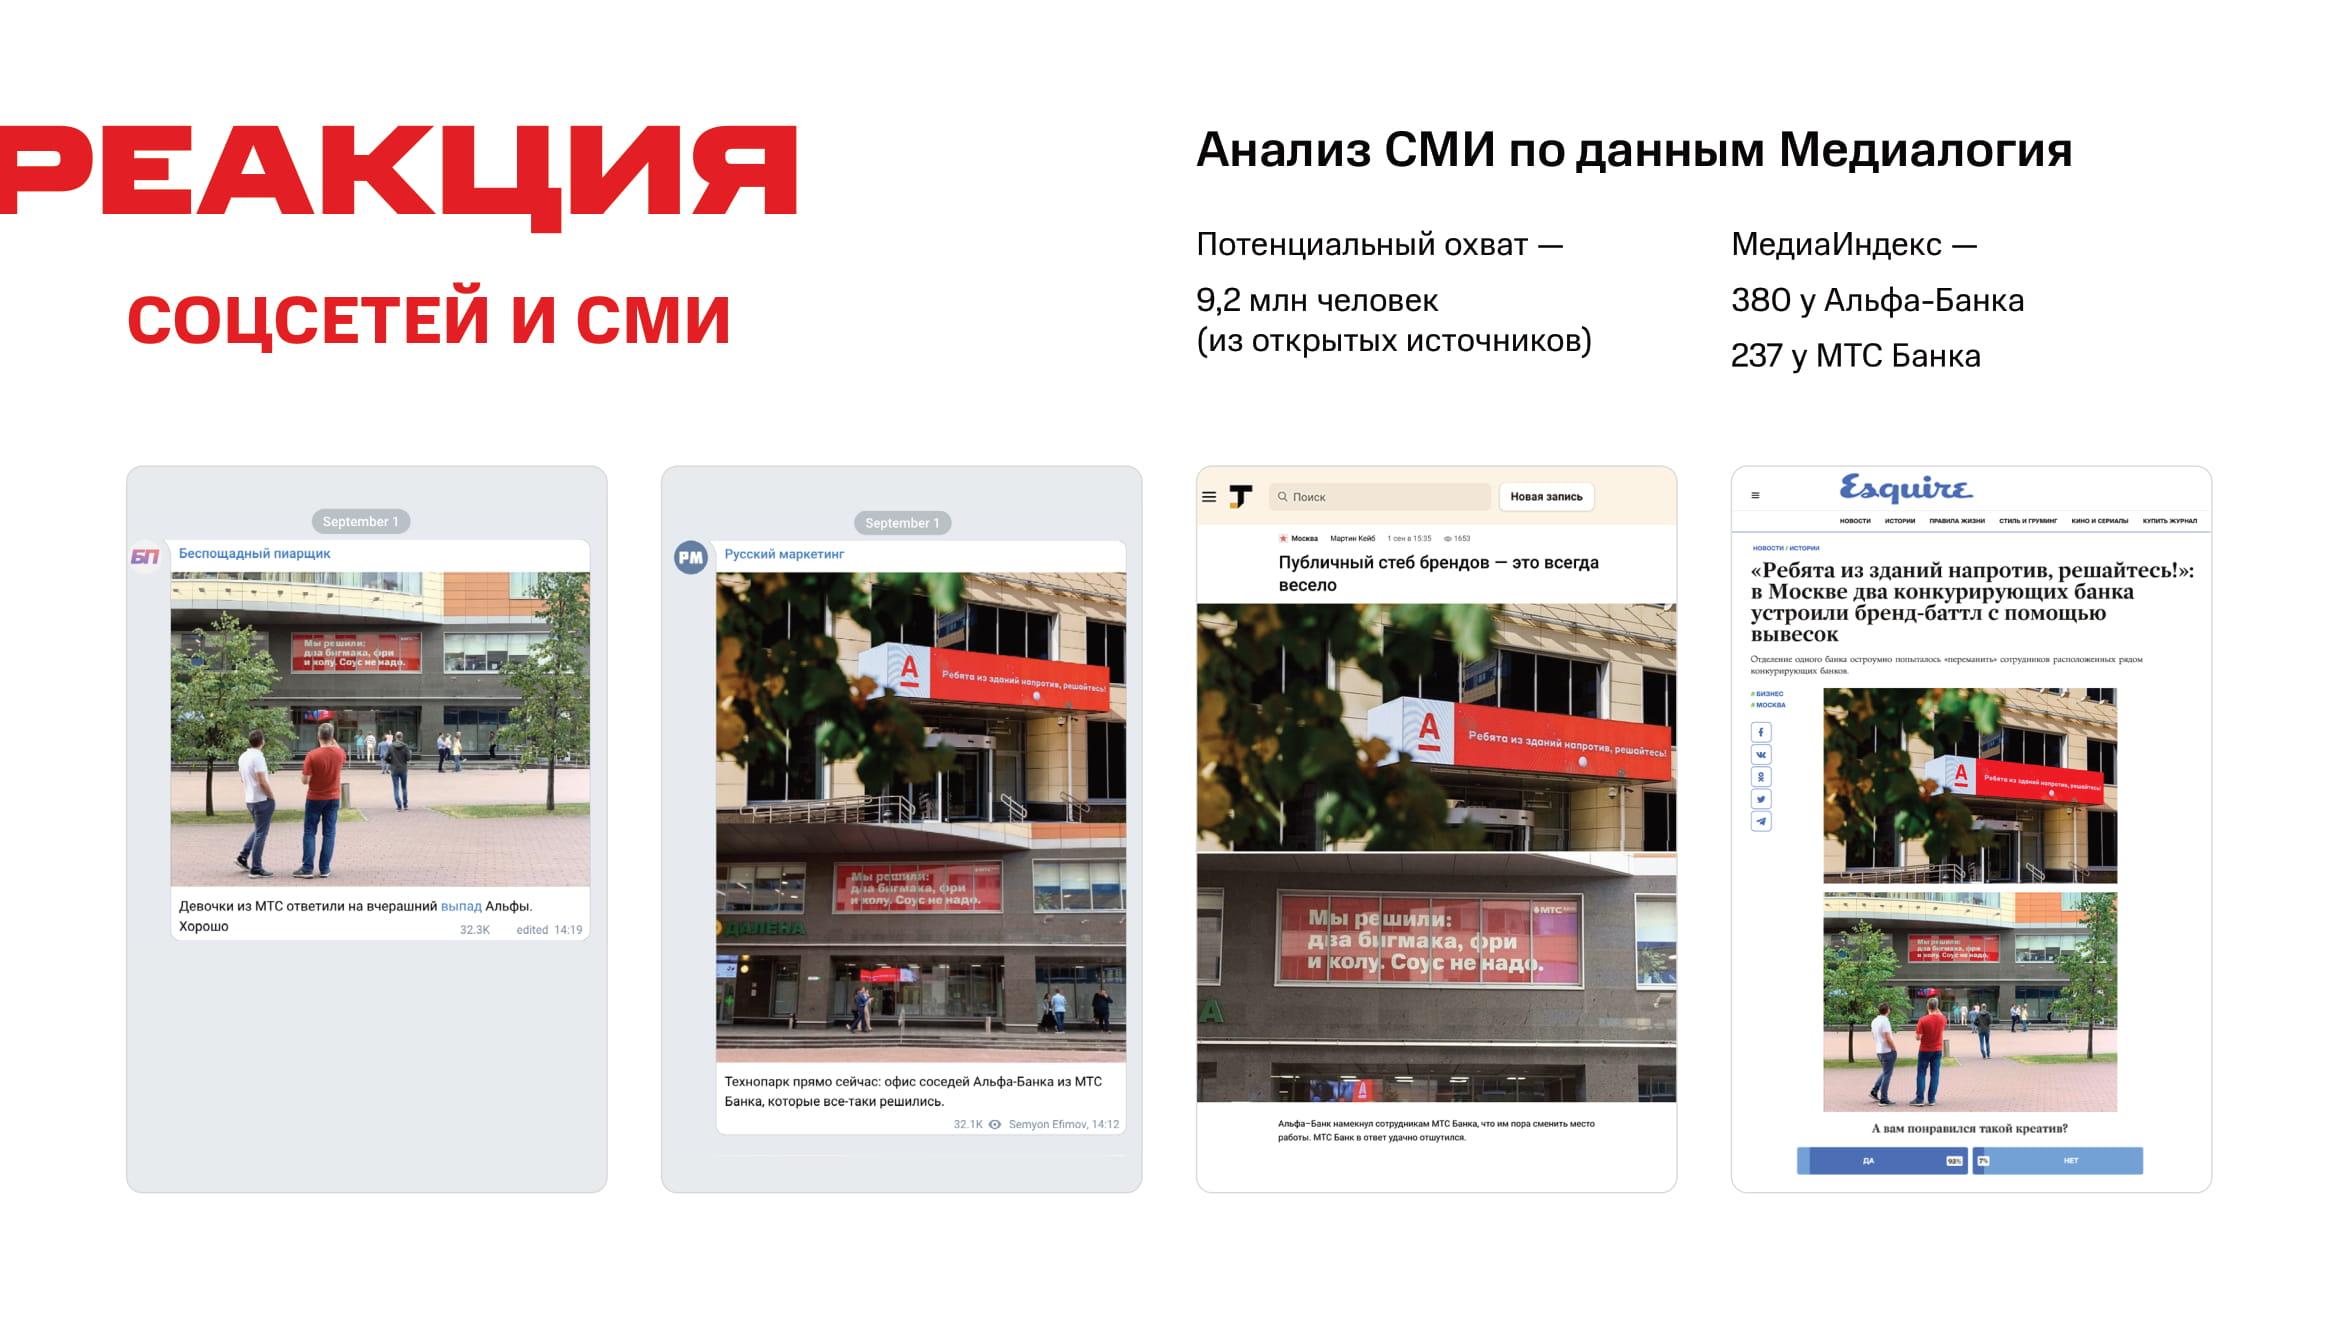 RFA_Креатив-года-2020_МТС-Банк-VS-Альфа-Банк-10